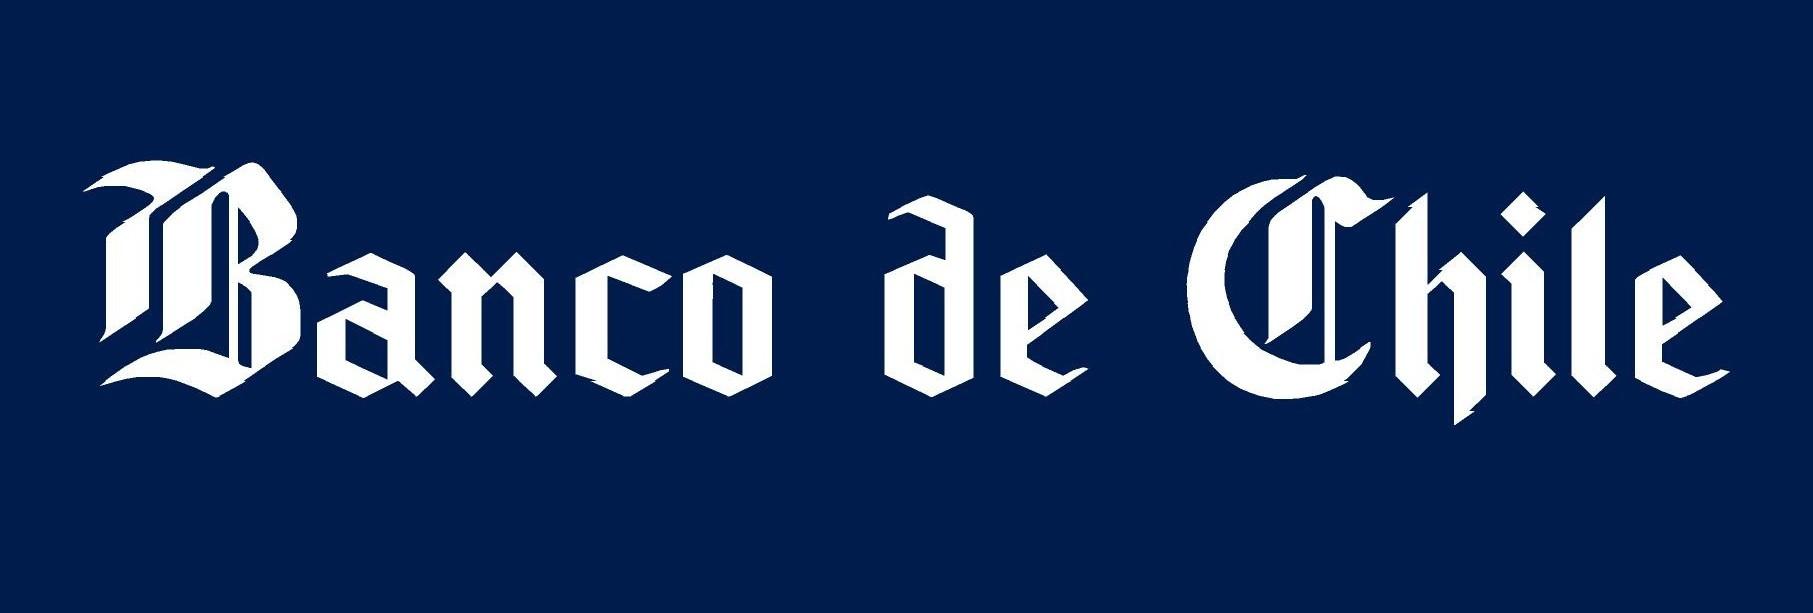 Banco de Chile Logo photo - 1